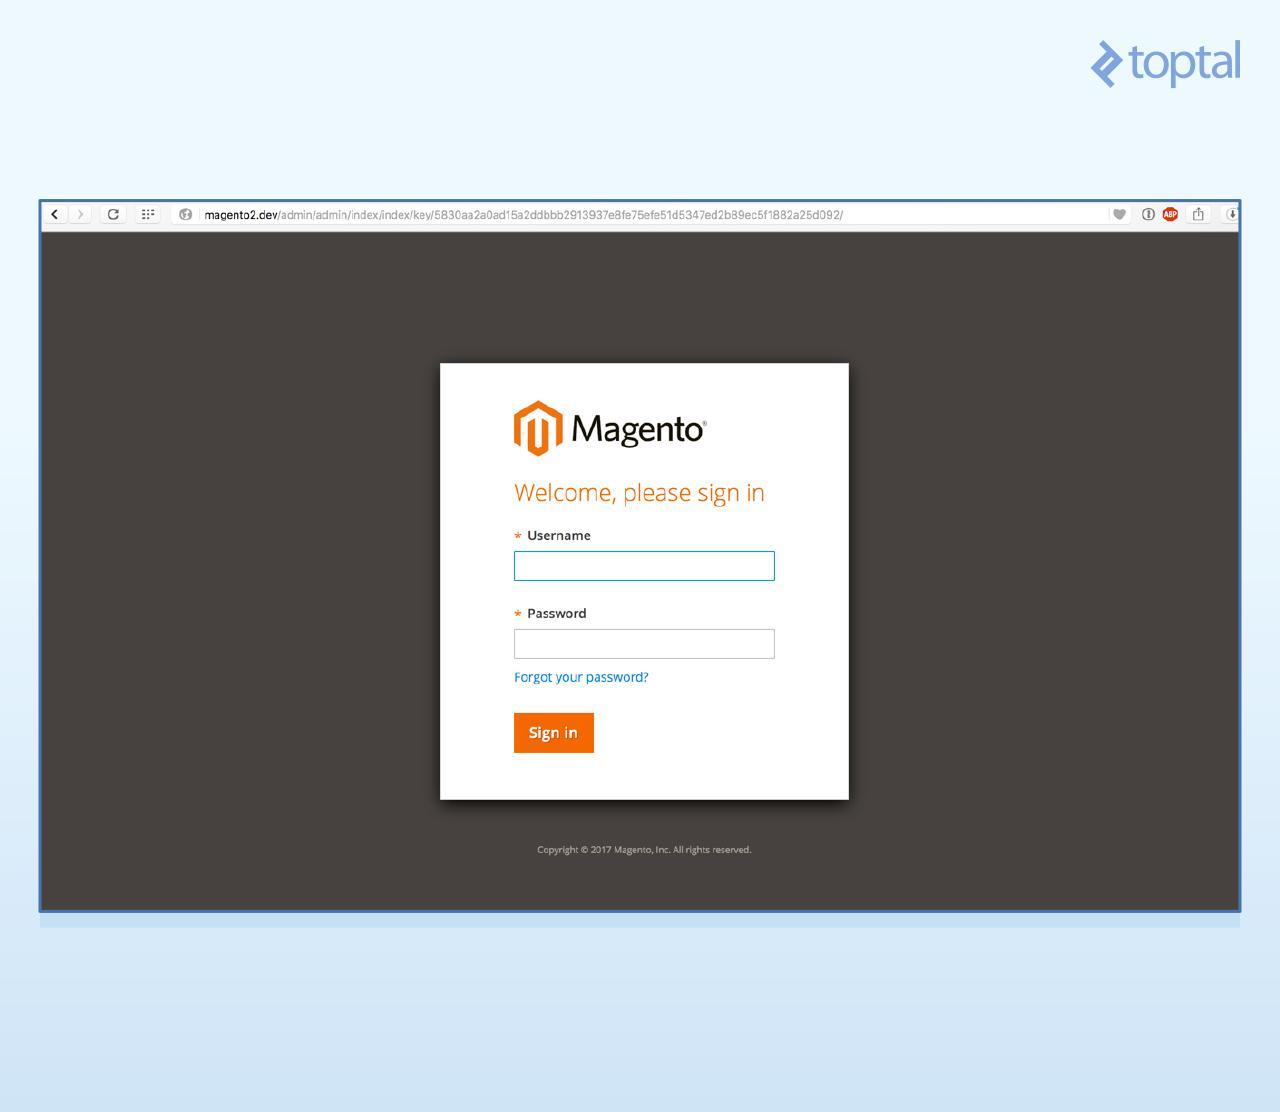 Magento 2 Tutorial: Building a Complete Module - Image 16